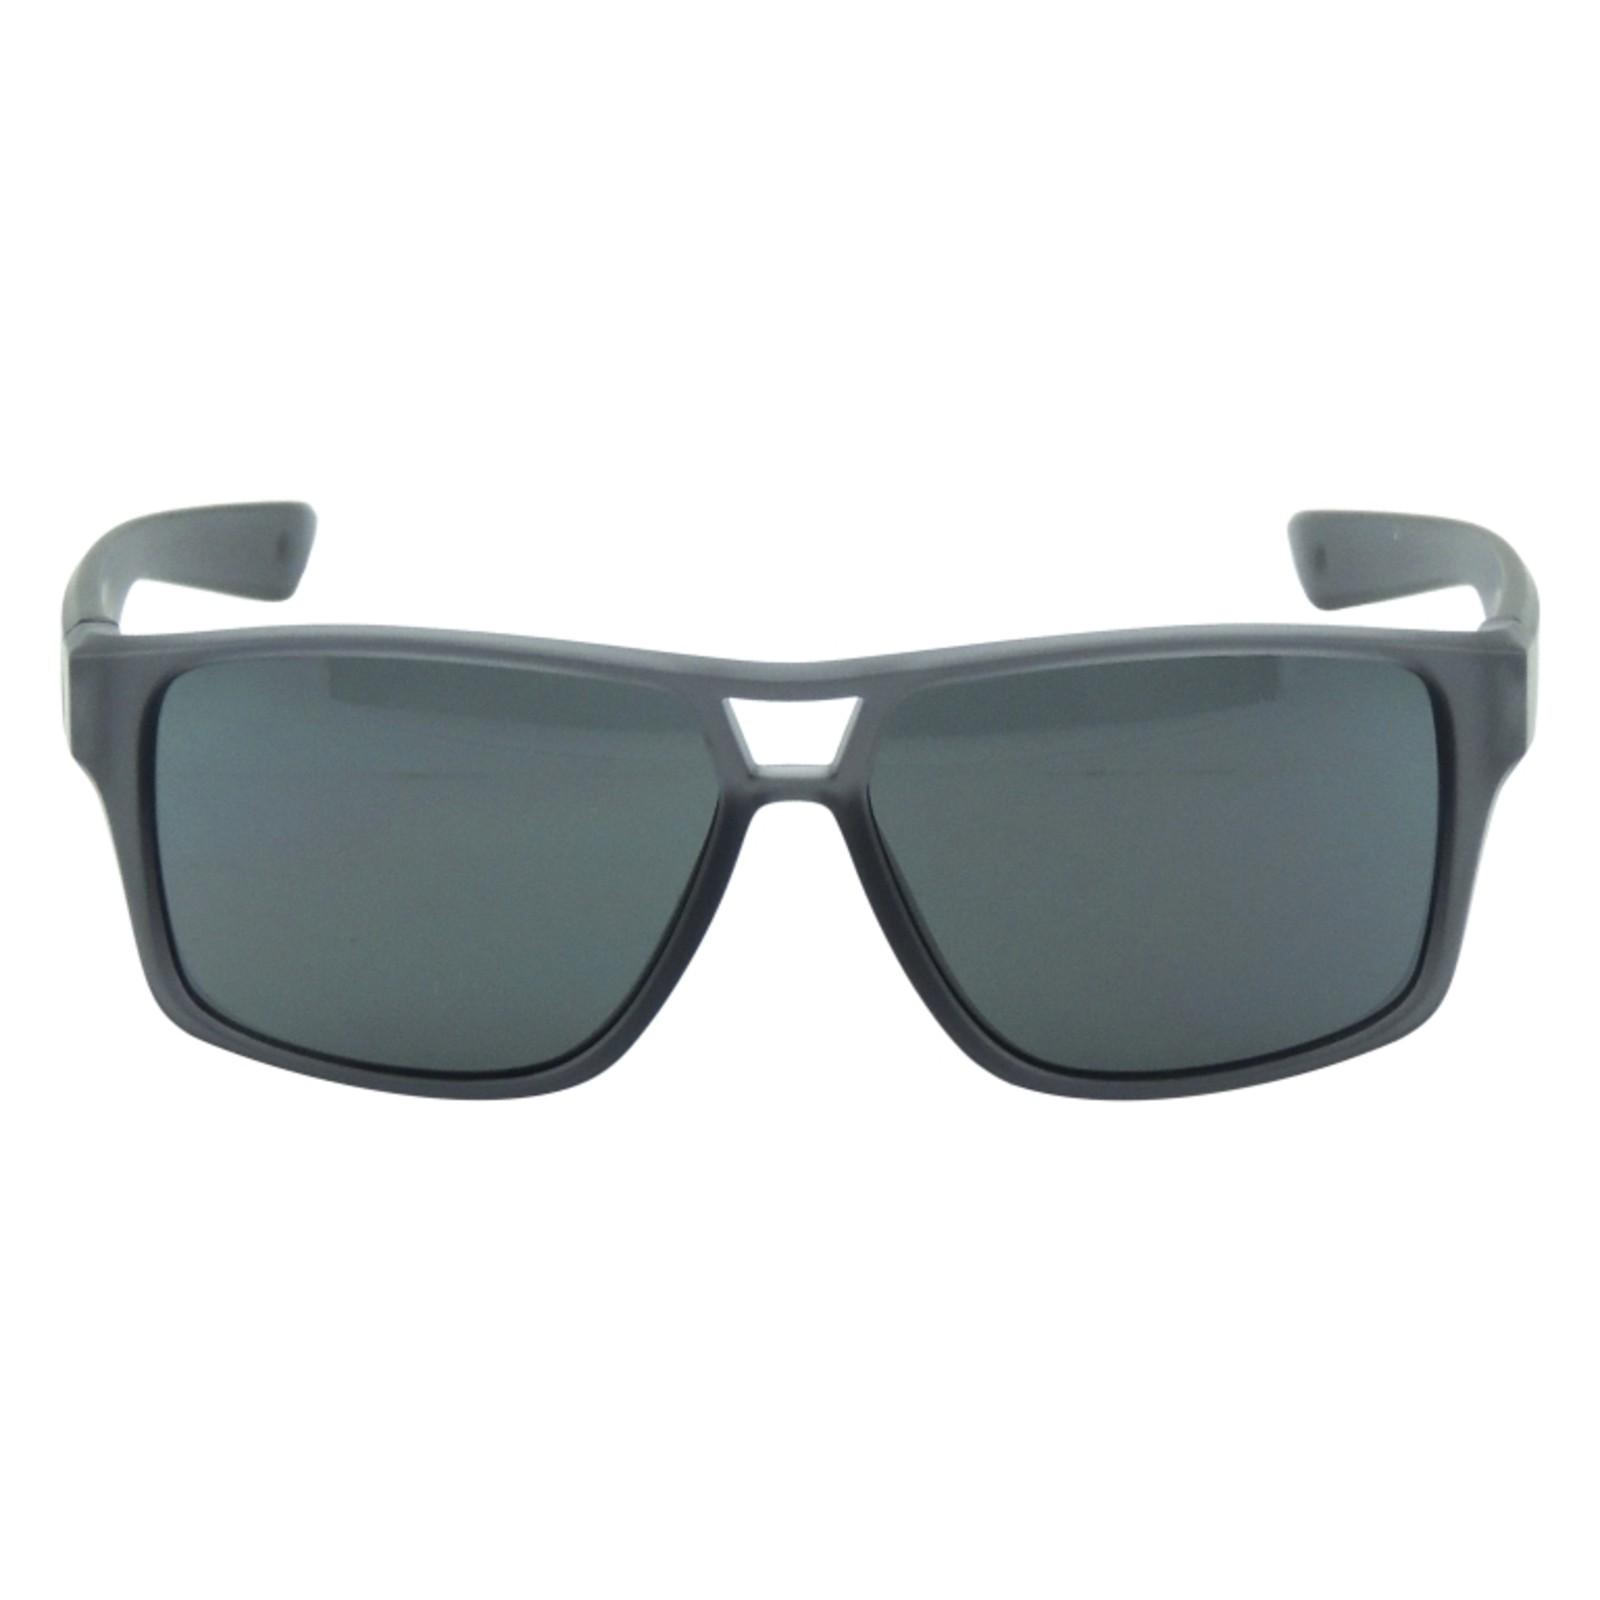 f0f5afc246e59 ... Óculos de Sol Masculino GUGA KUERTEN Acetato Cinza Approach II GK118.  ...